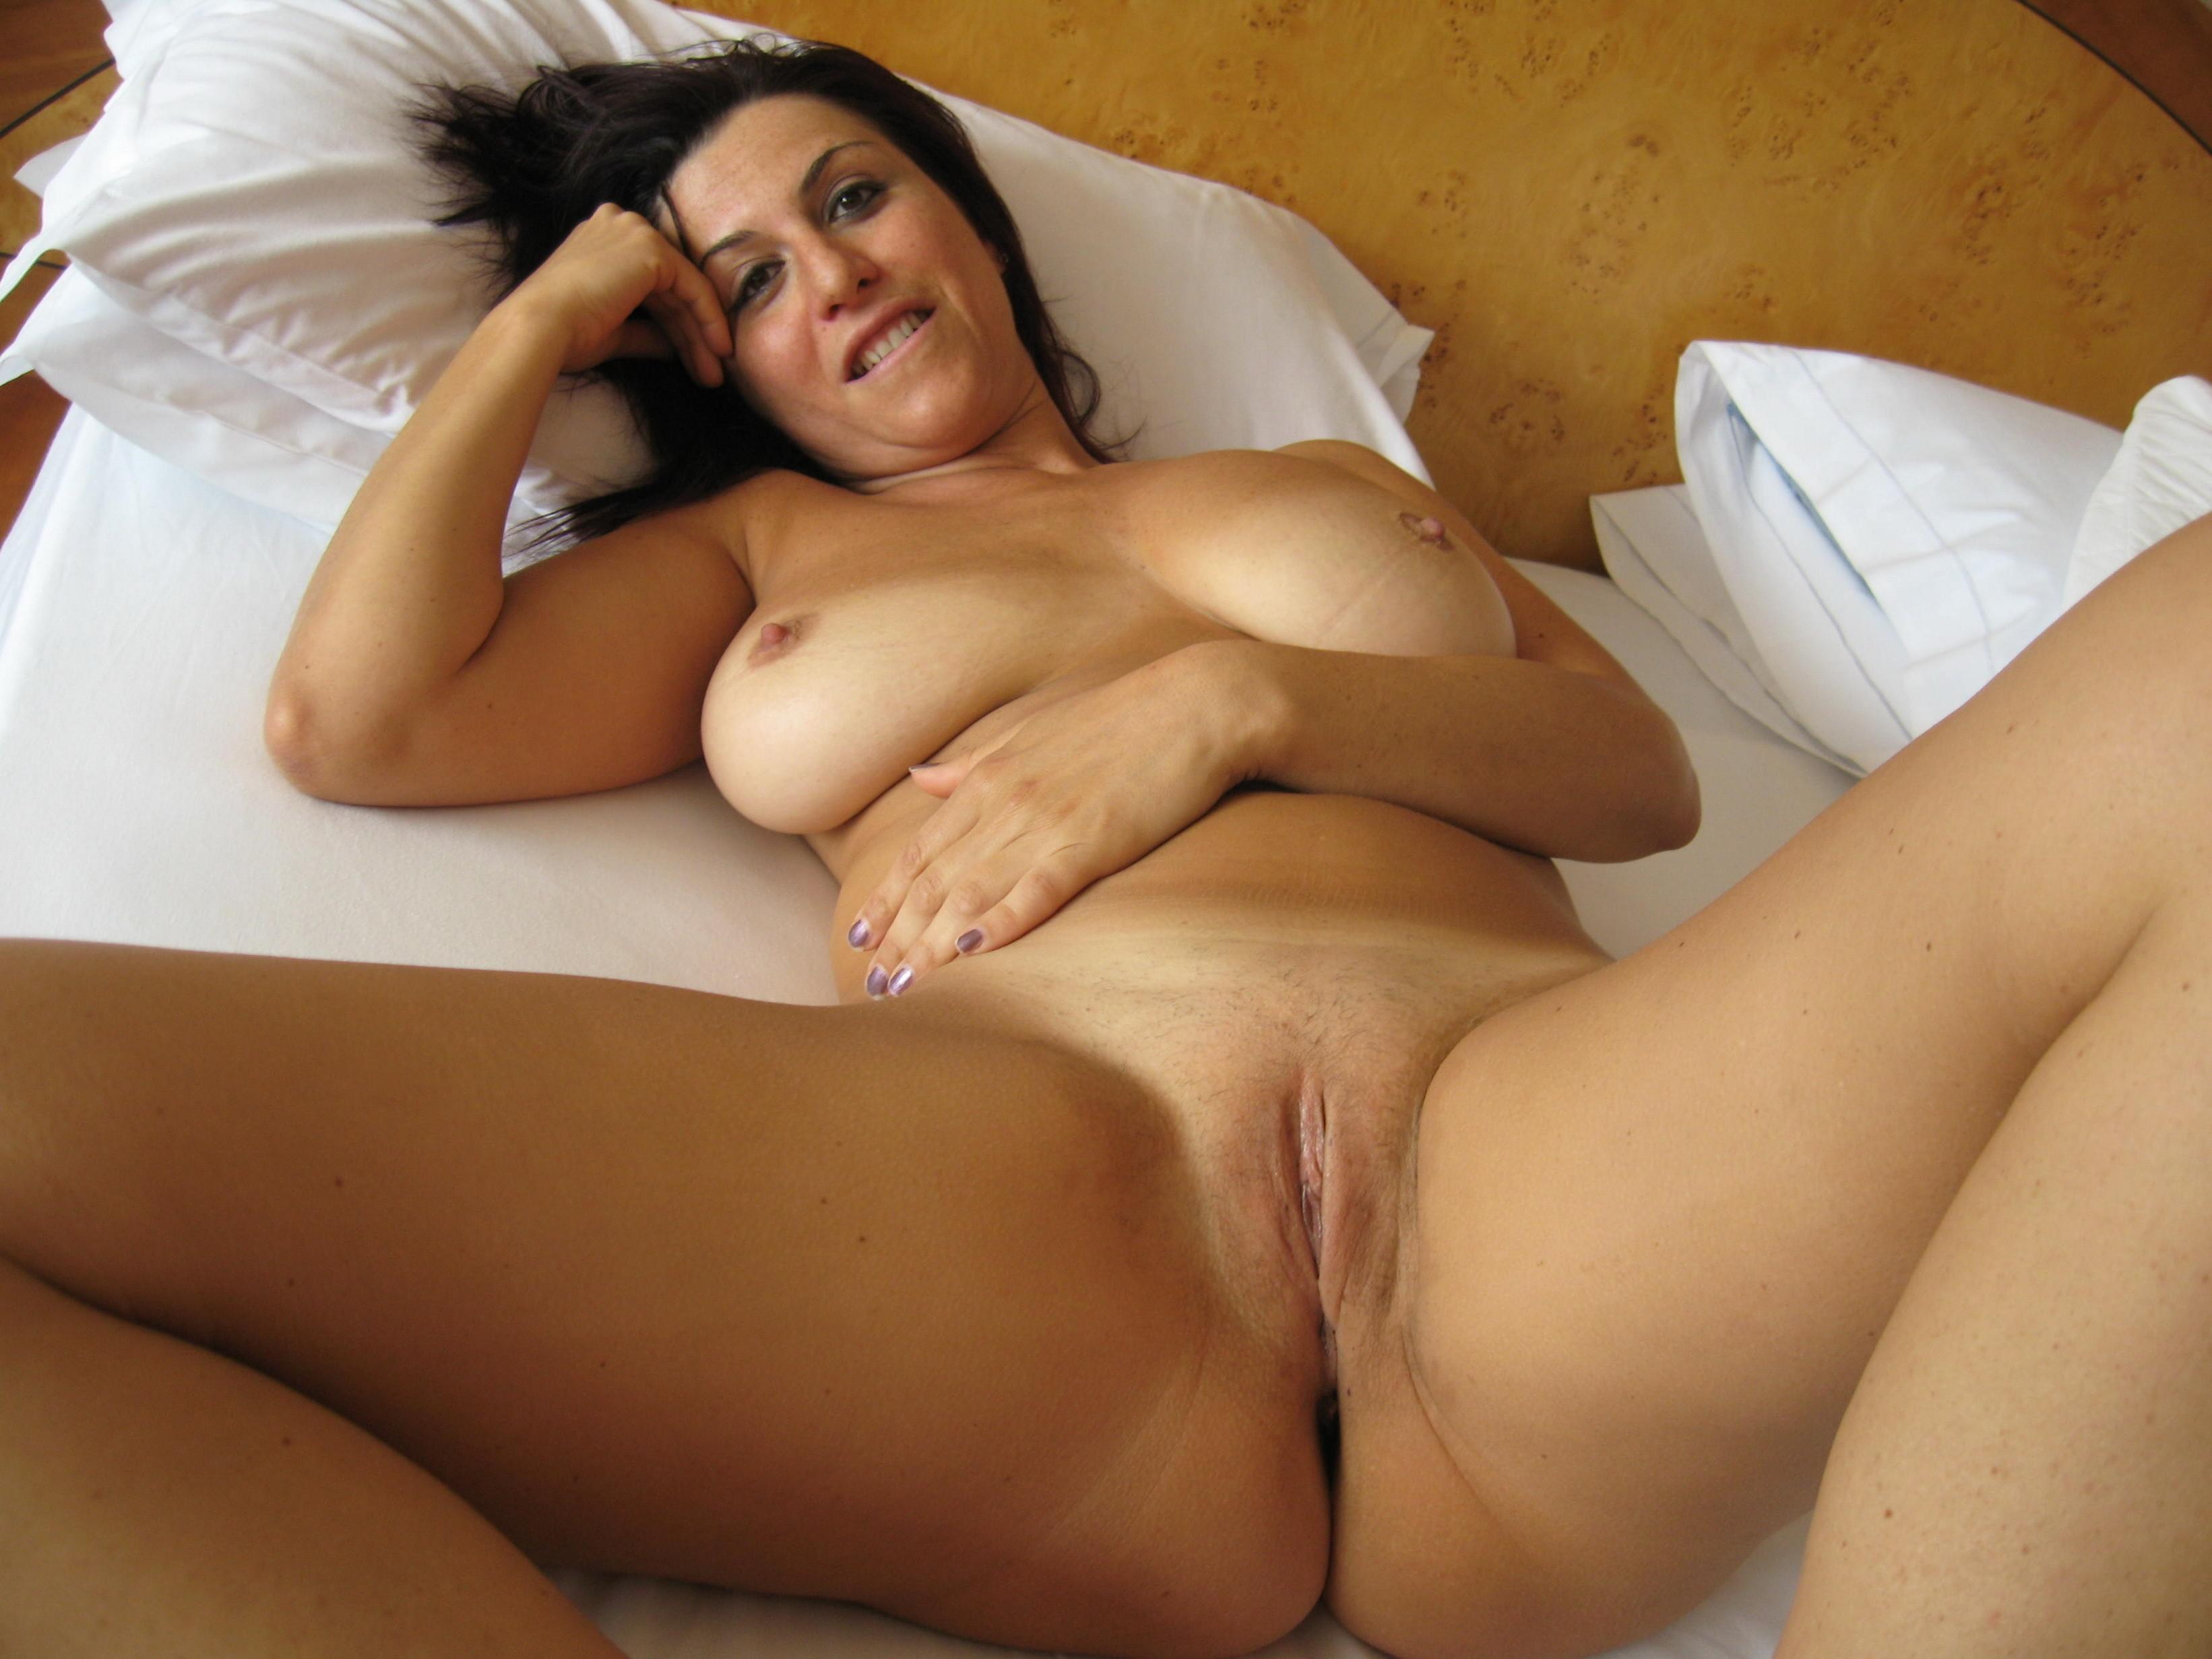 bbw legs up naked